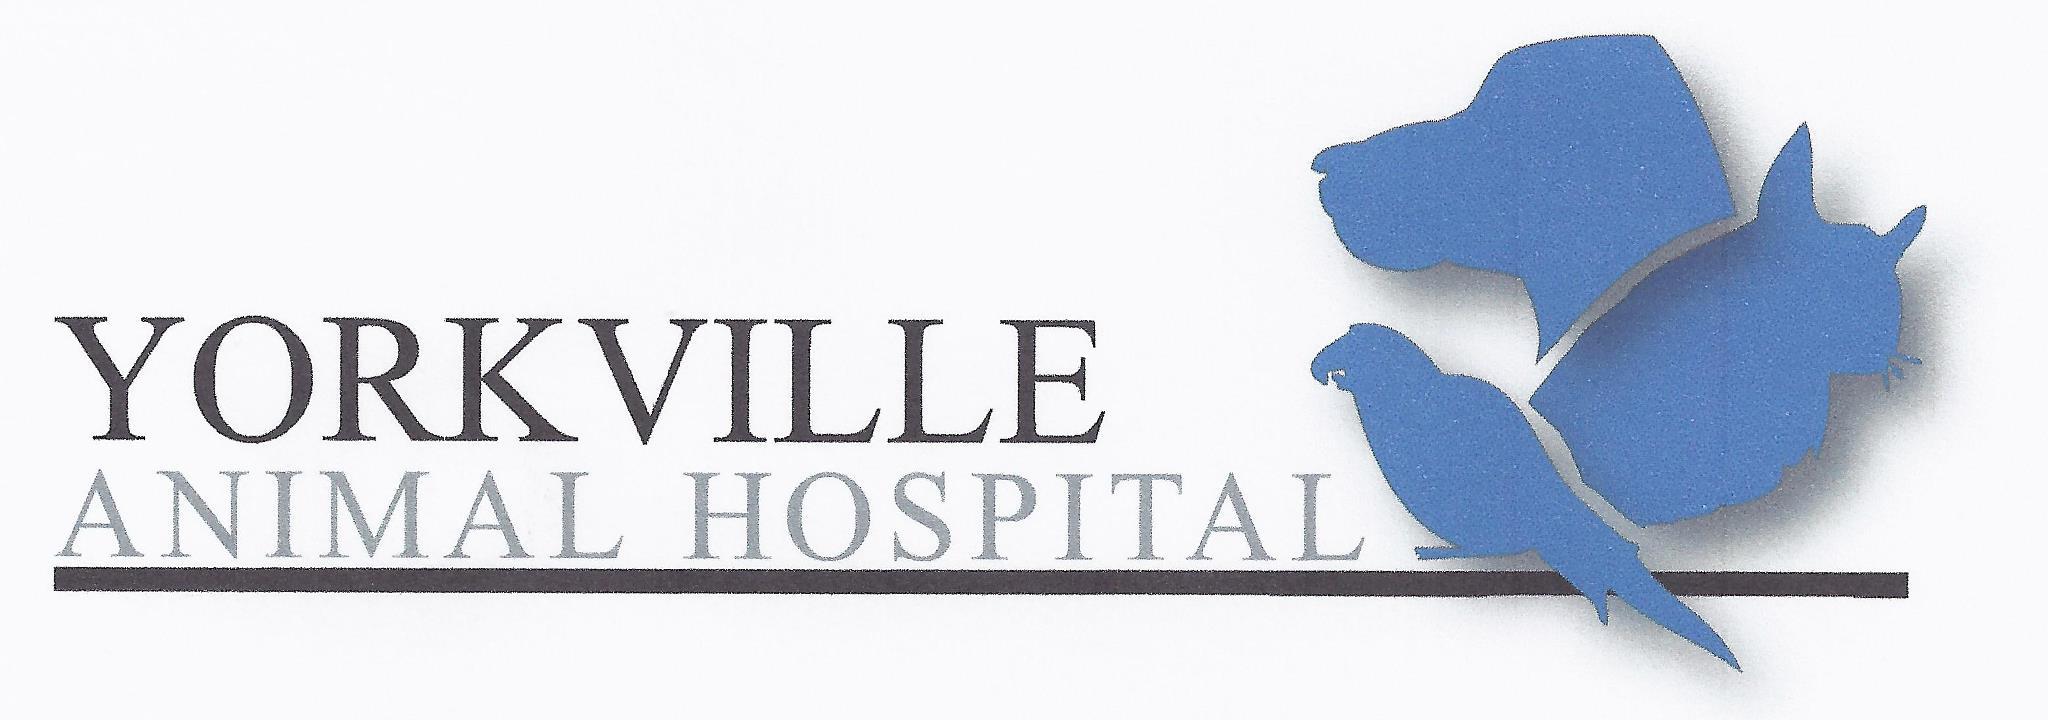 Yorkville Animal Hospital